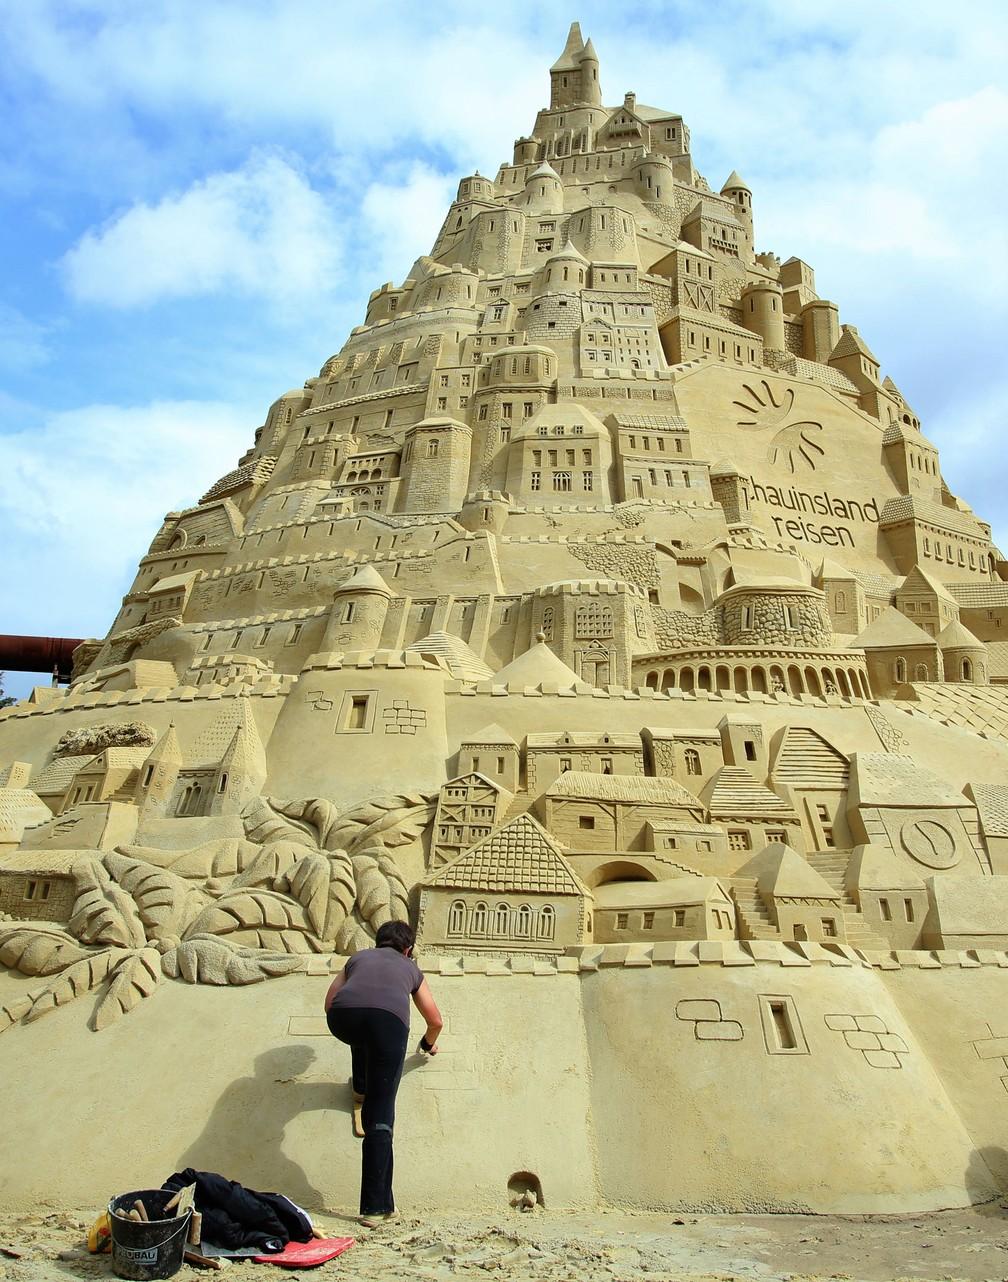 Alemanha finaliza castelo gigante de areia para tentar recorde mundial (Foto: Ina Fassbender/dpa via AP)